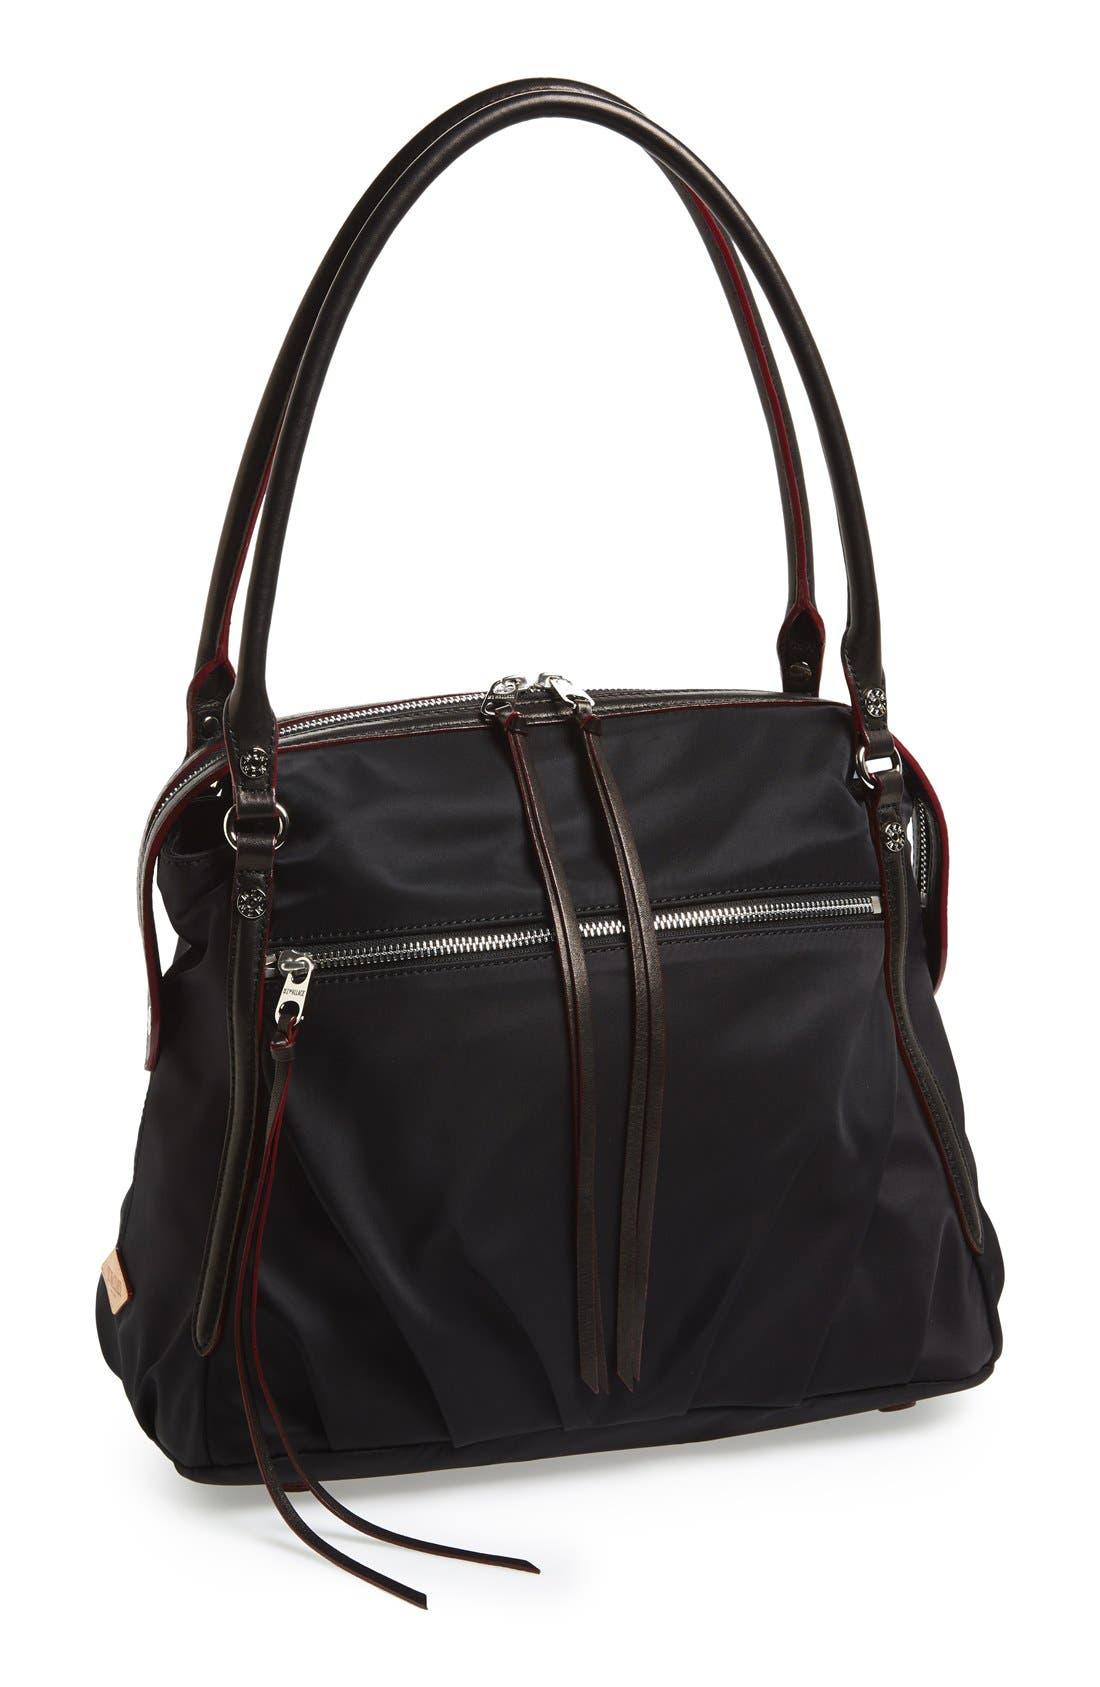 Alternate Image 1 Selected - MZ Wallace 'Moto Georgie' Bedford Nylon Shoulder Bag